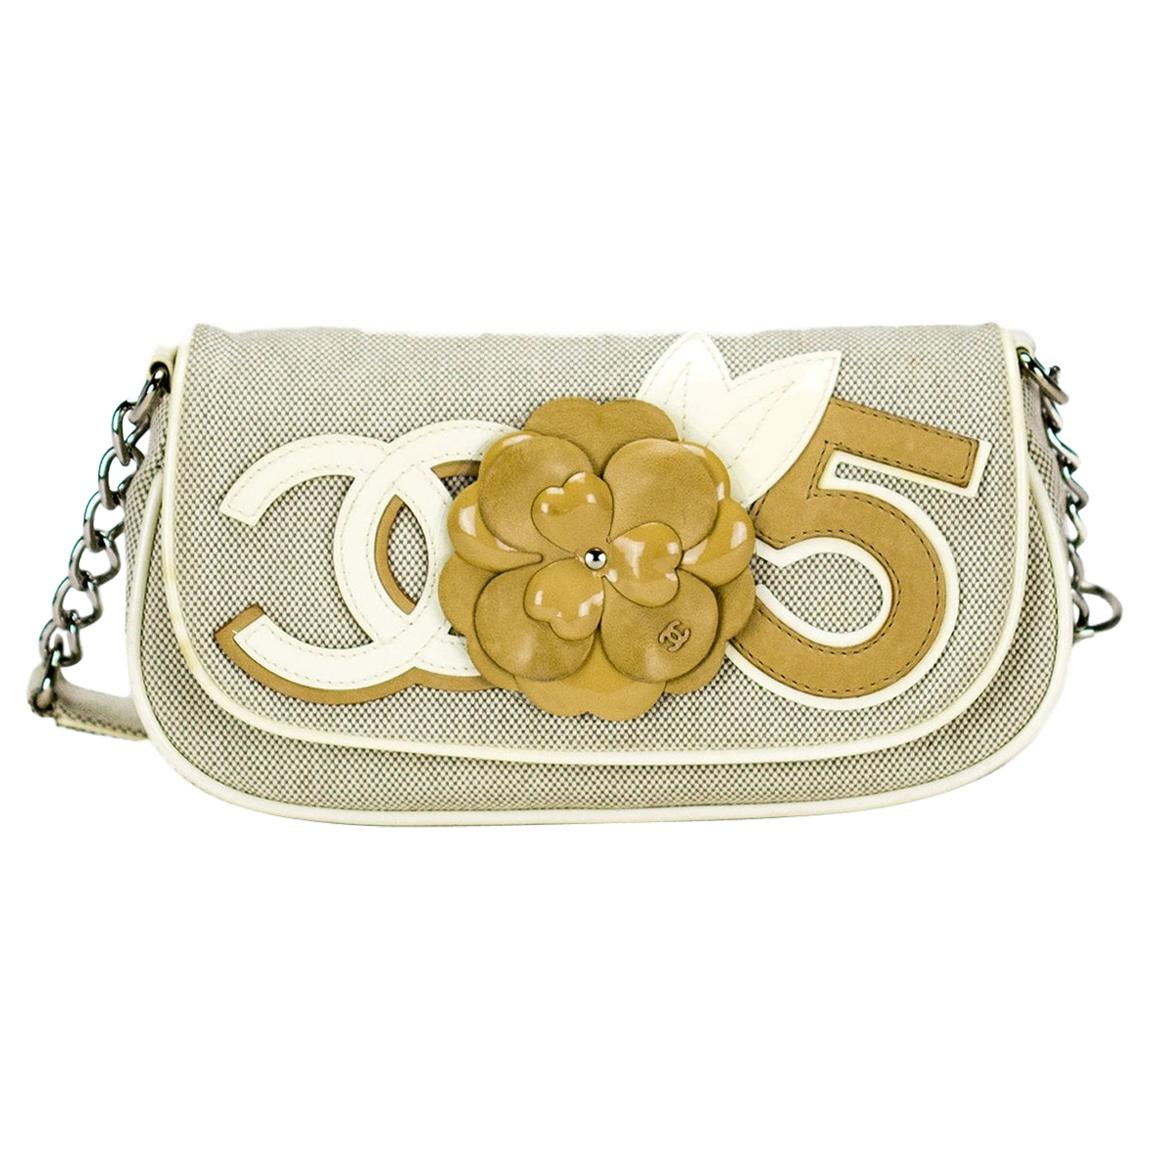 Chanel Beige Camelia Small Flap Bag